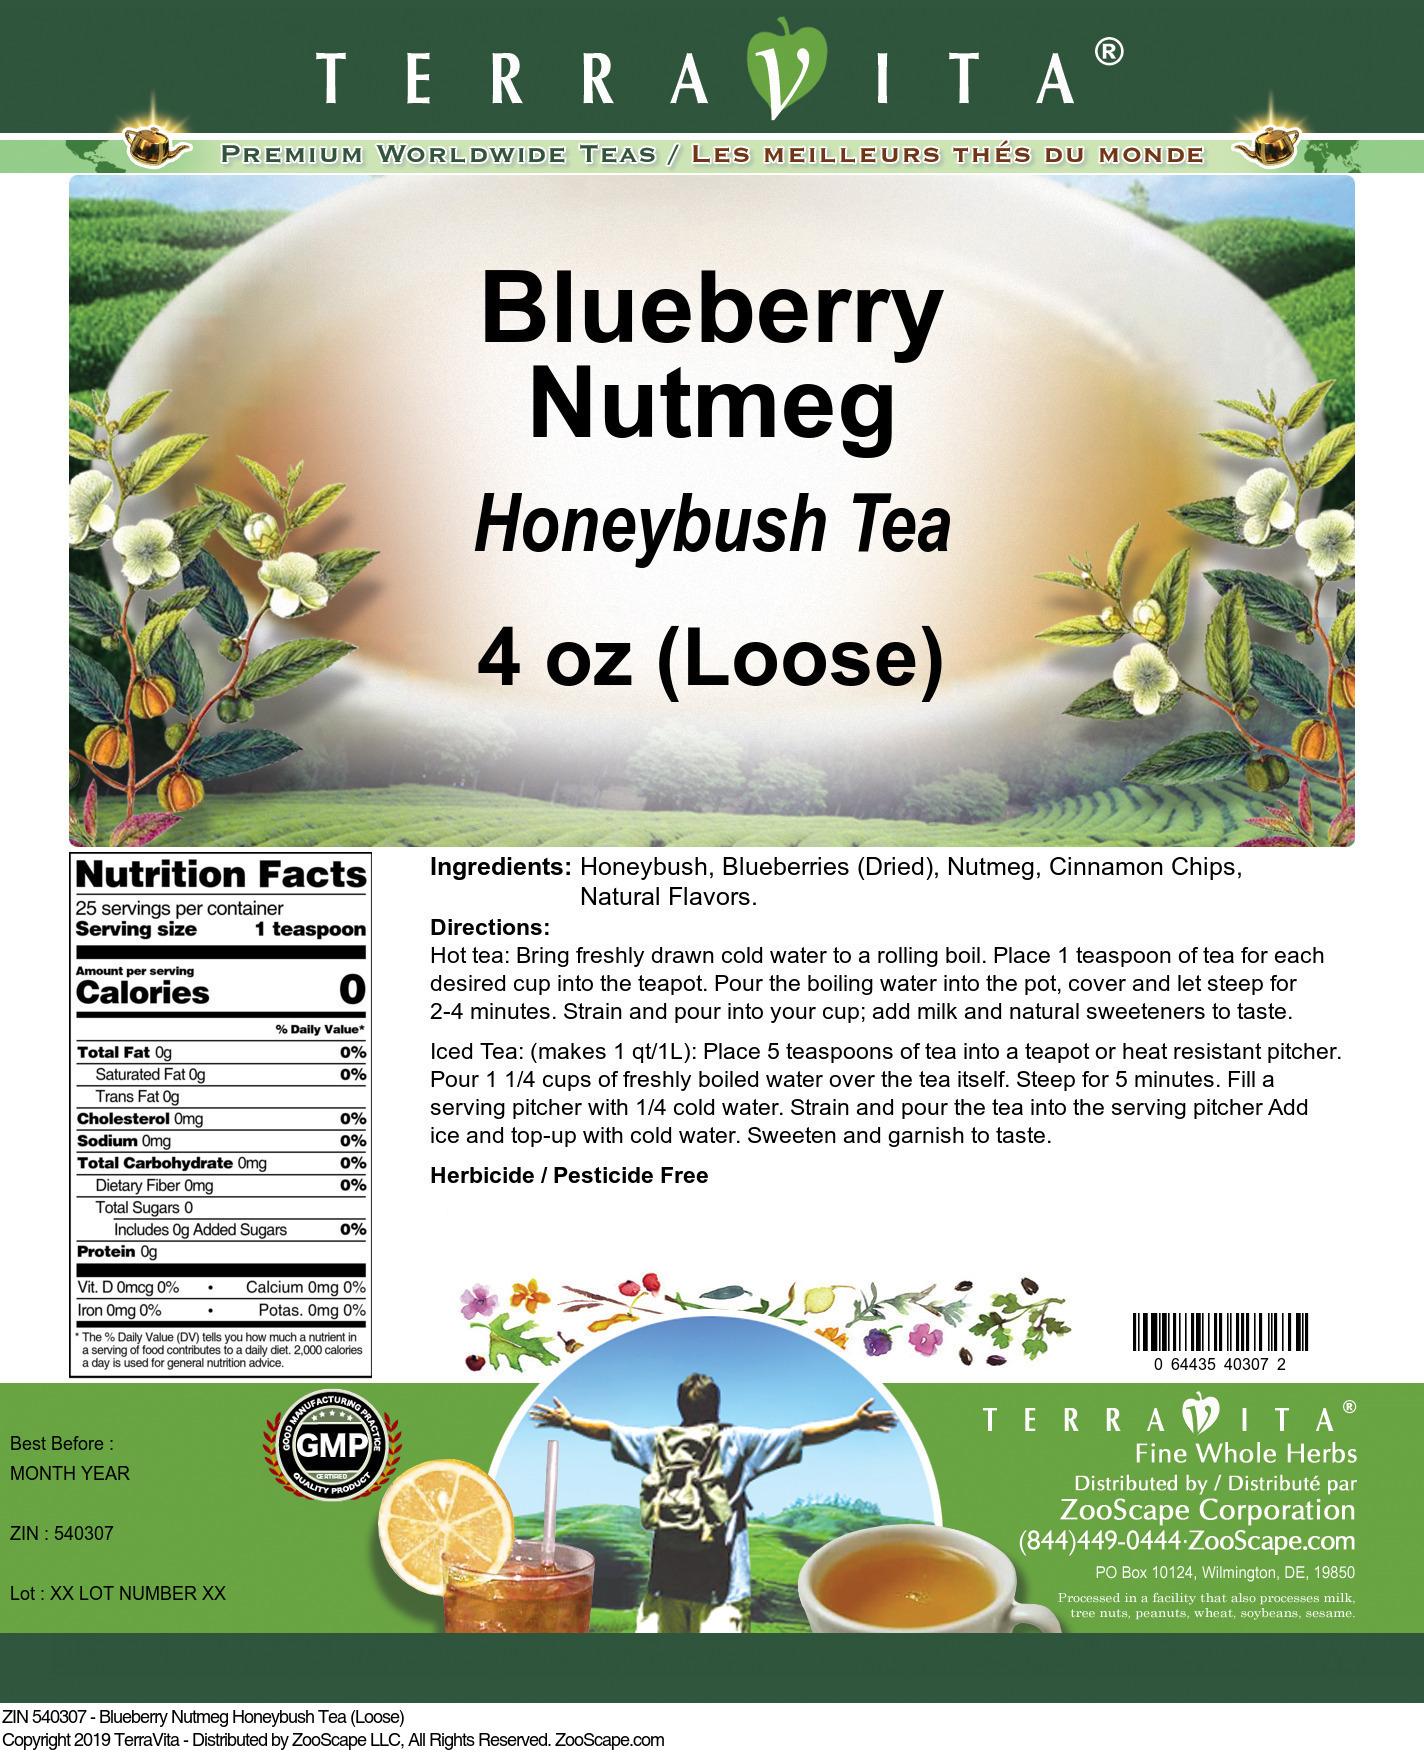 Blueberry Nutmeg Honeybush Tea (Loose)